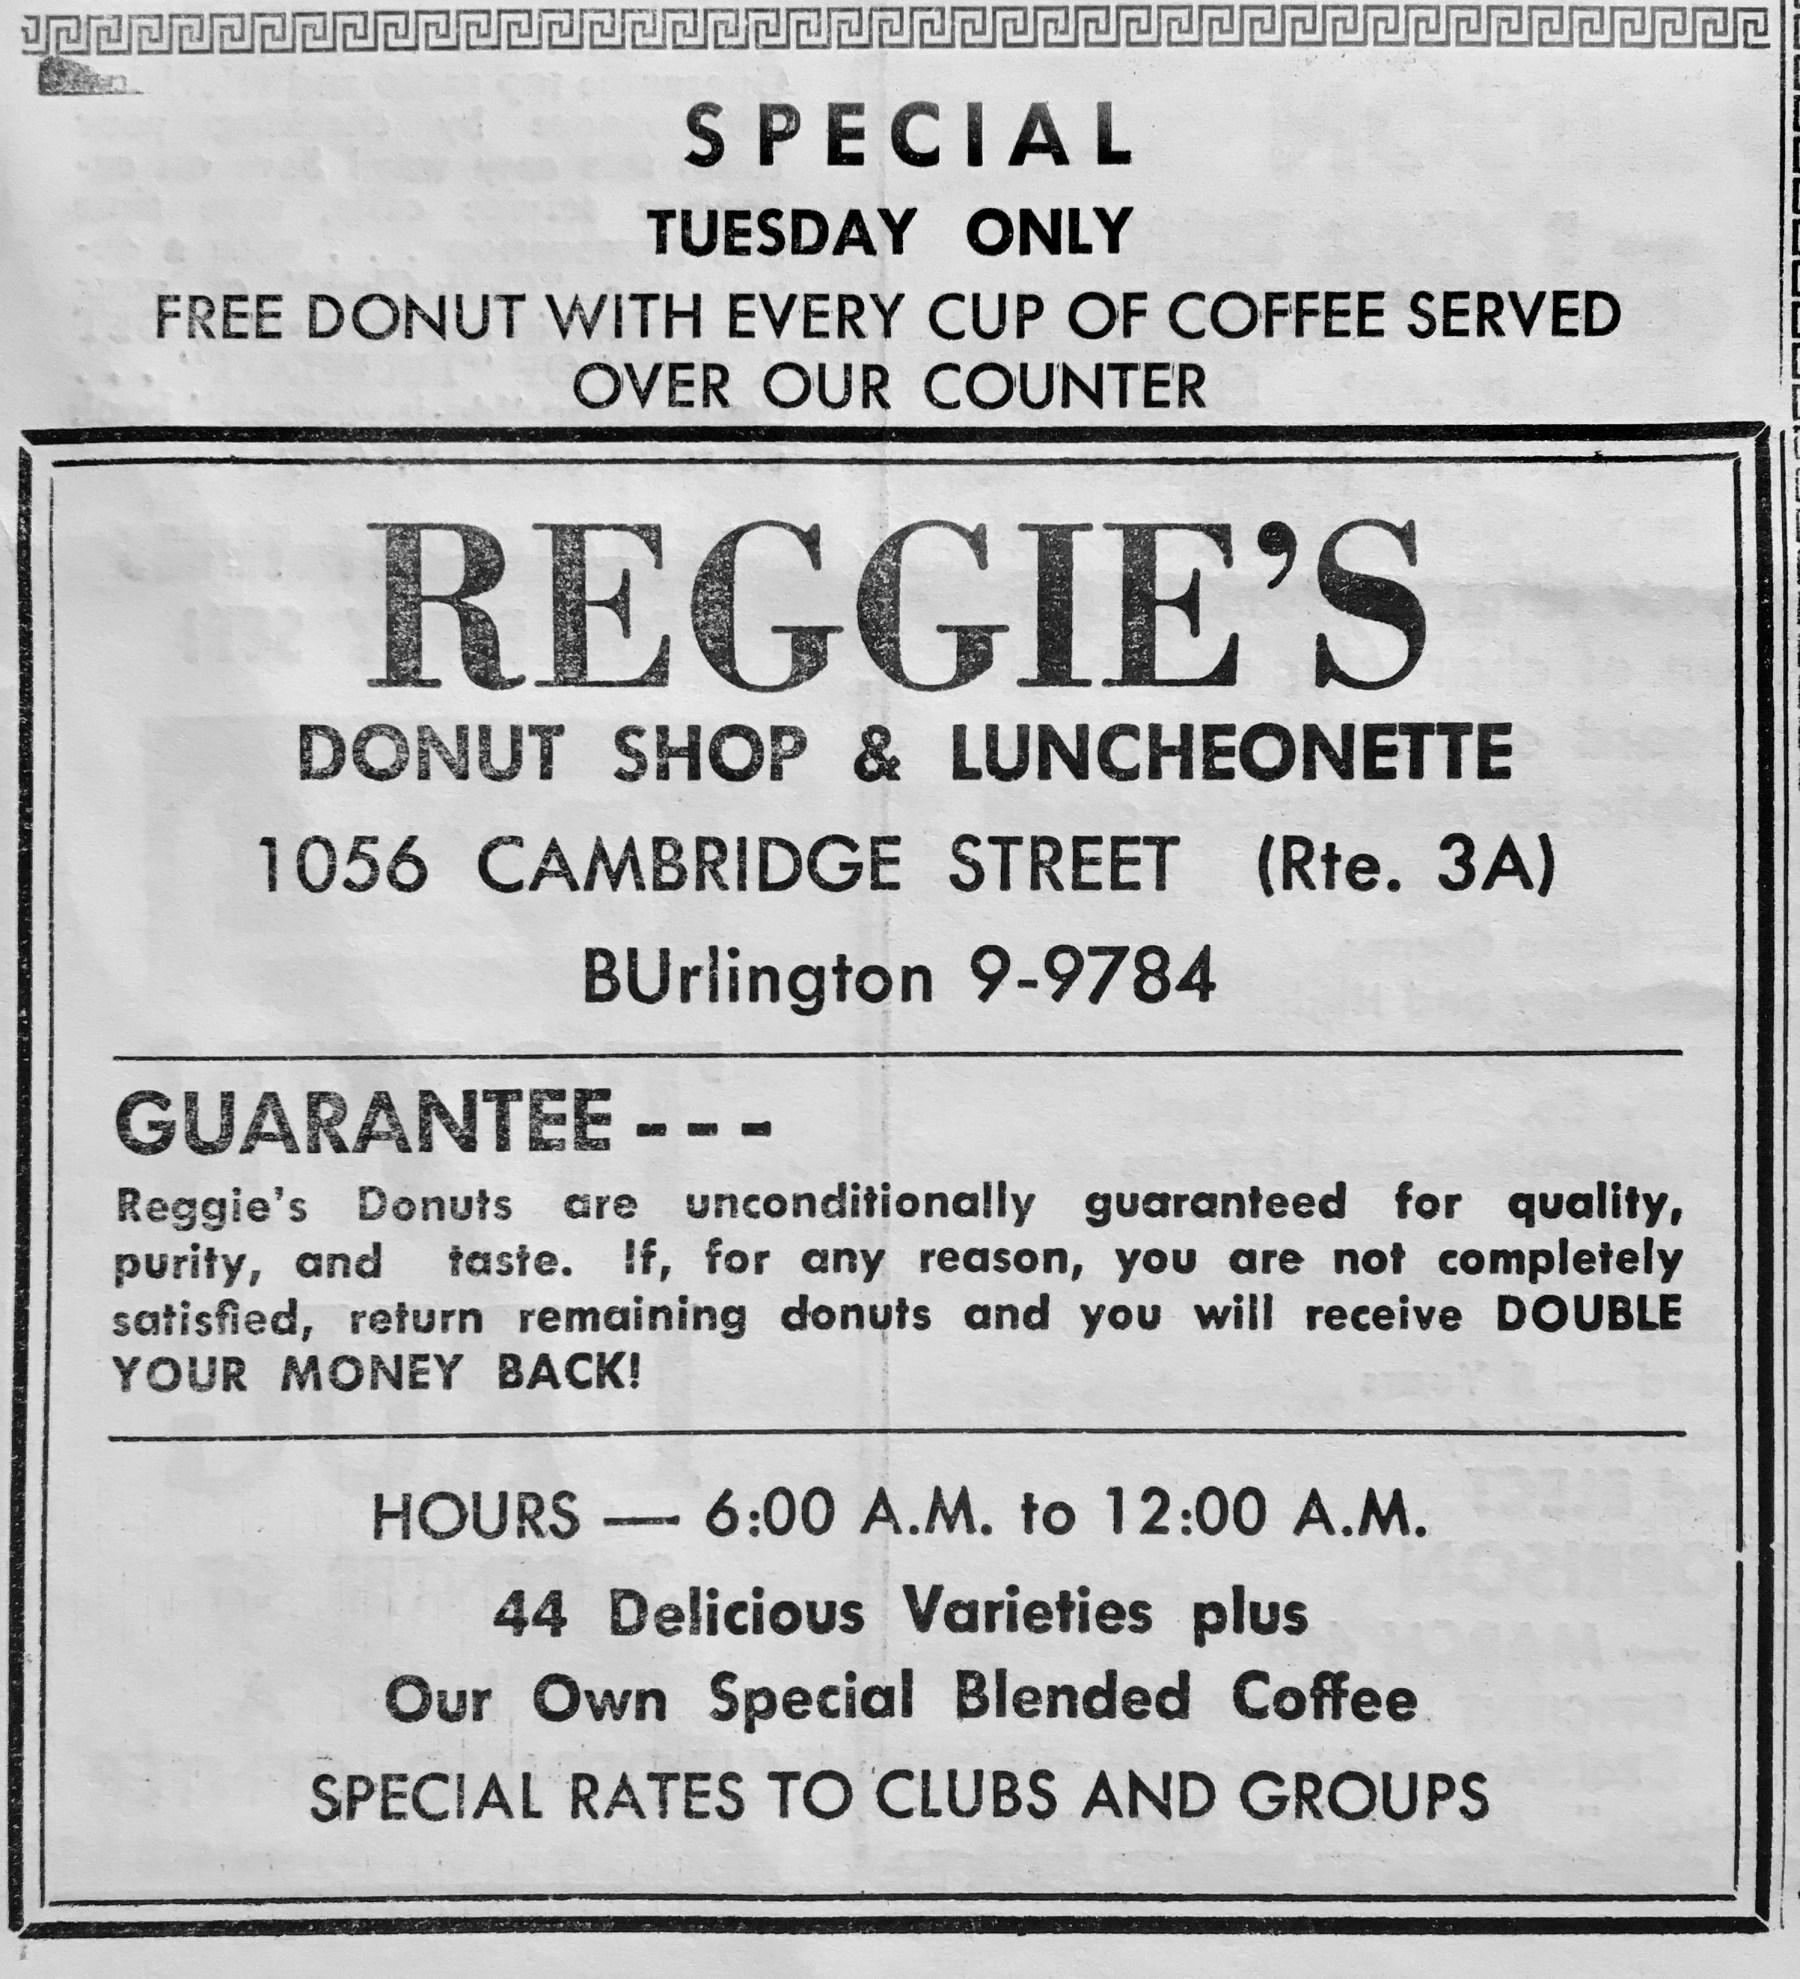 Reggie's Donut Shop & Luncheonette